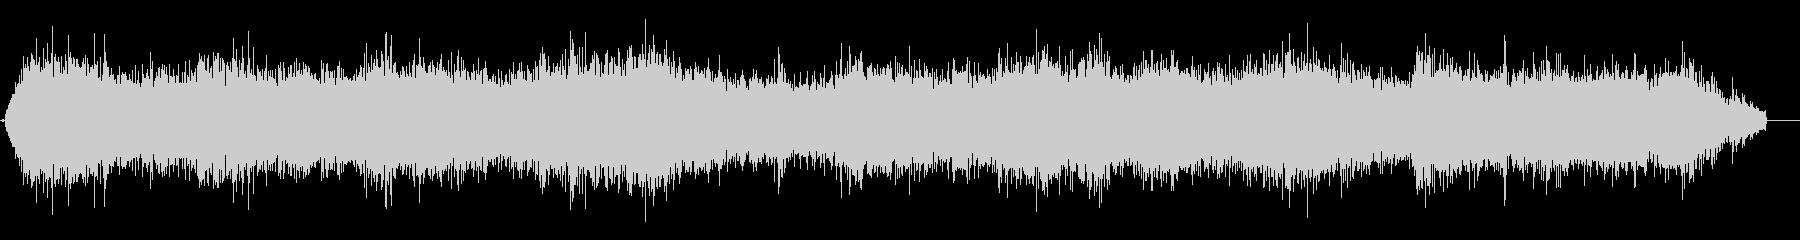 ELECTRIC HEDGE TR...の未再生の波形